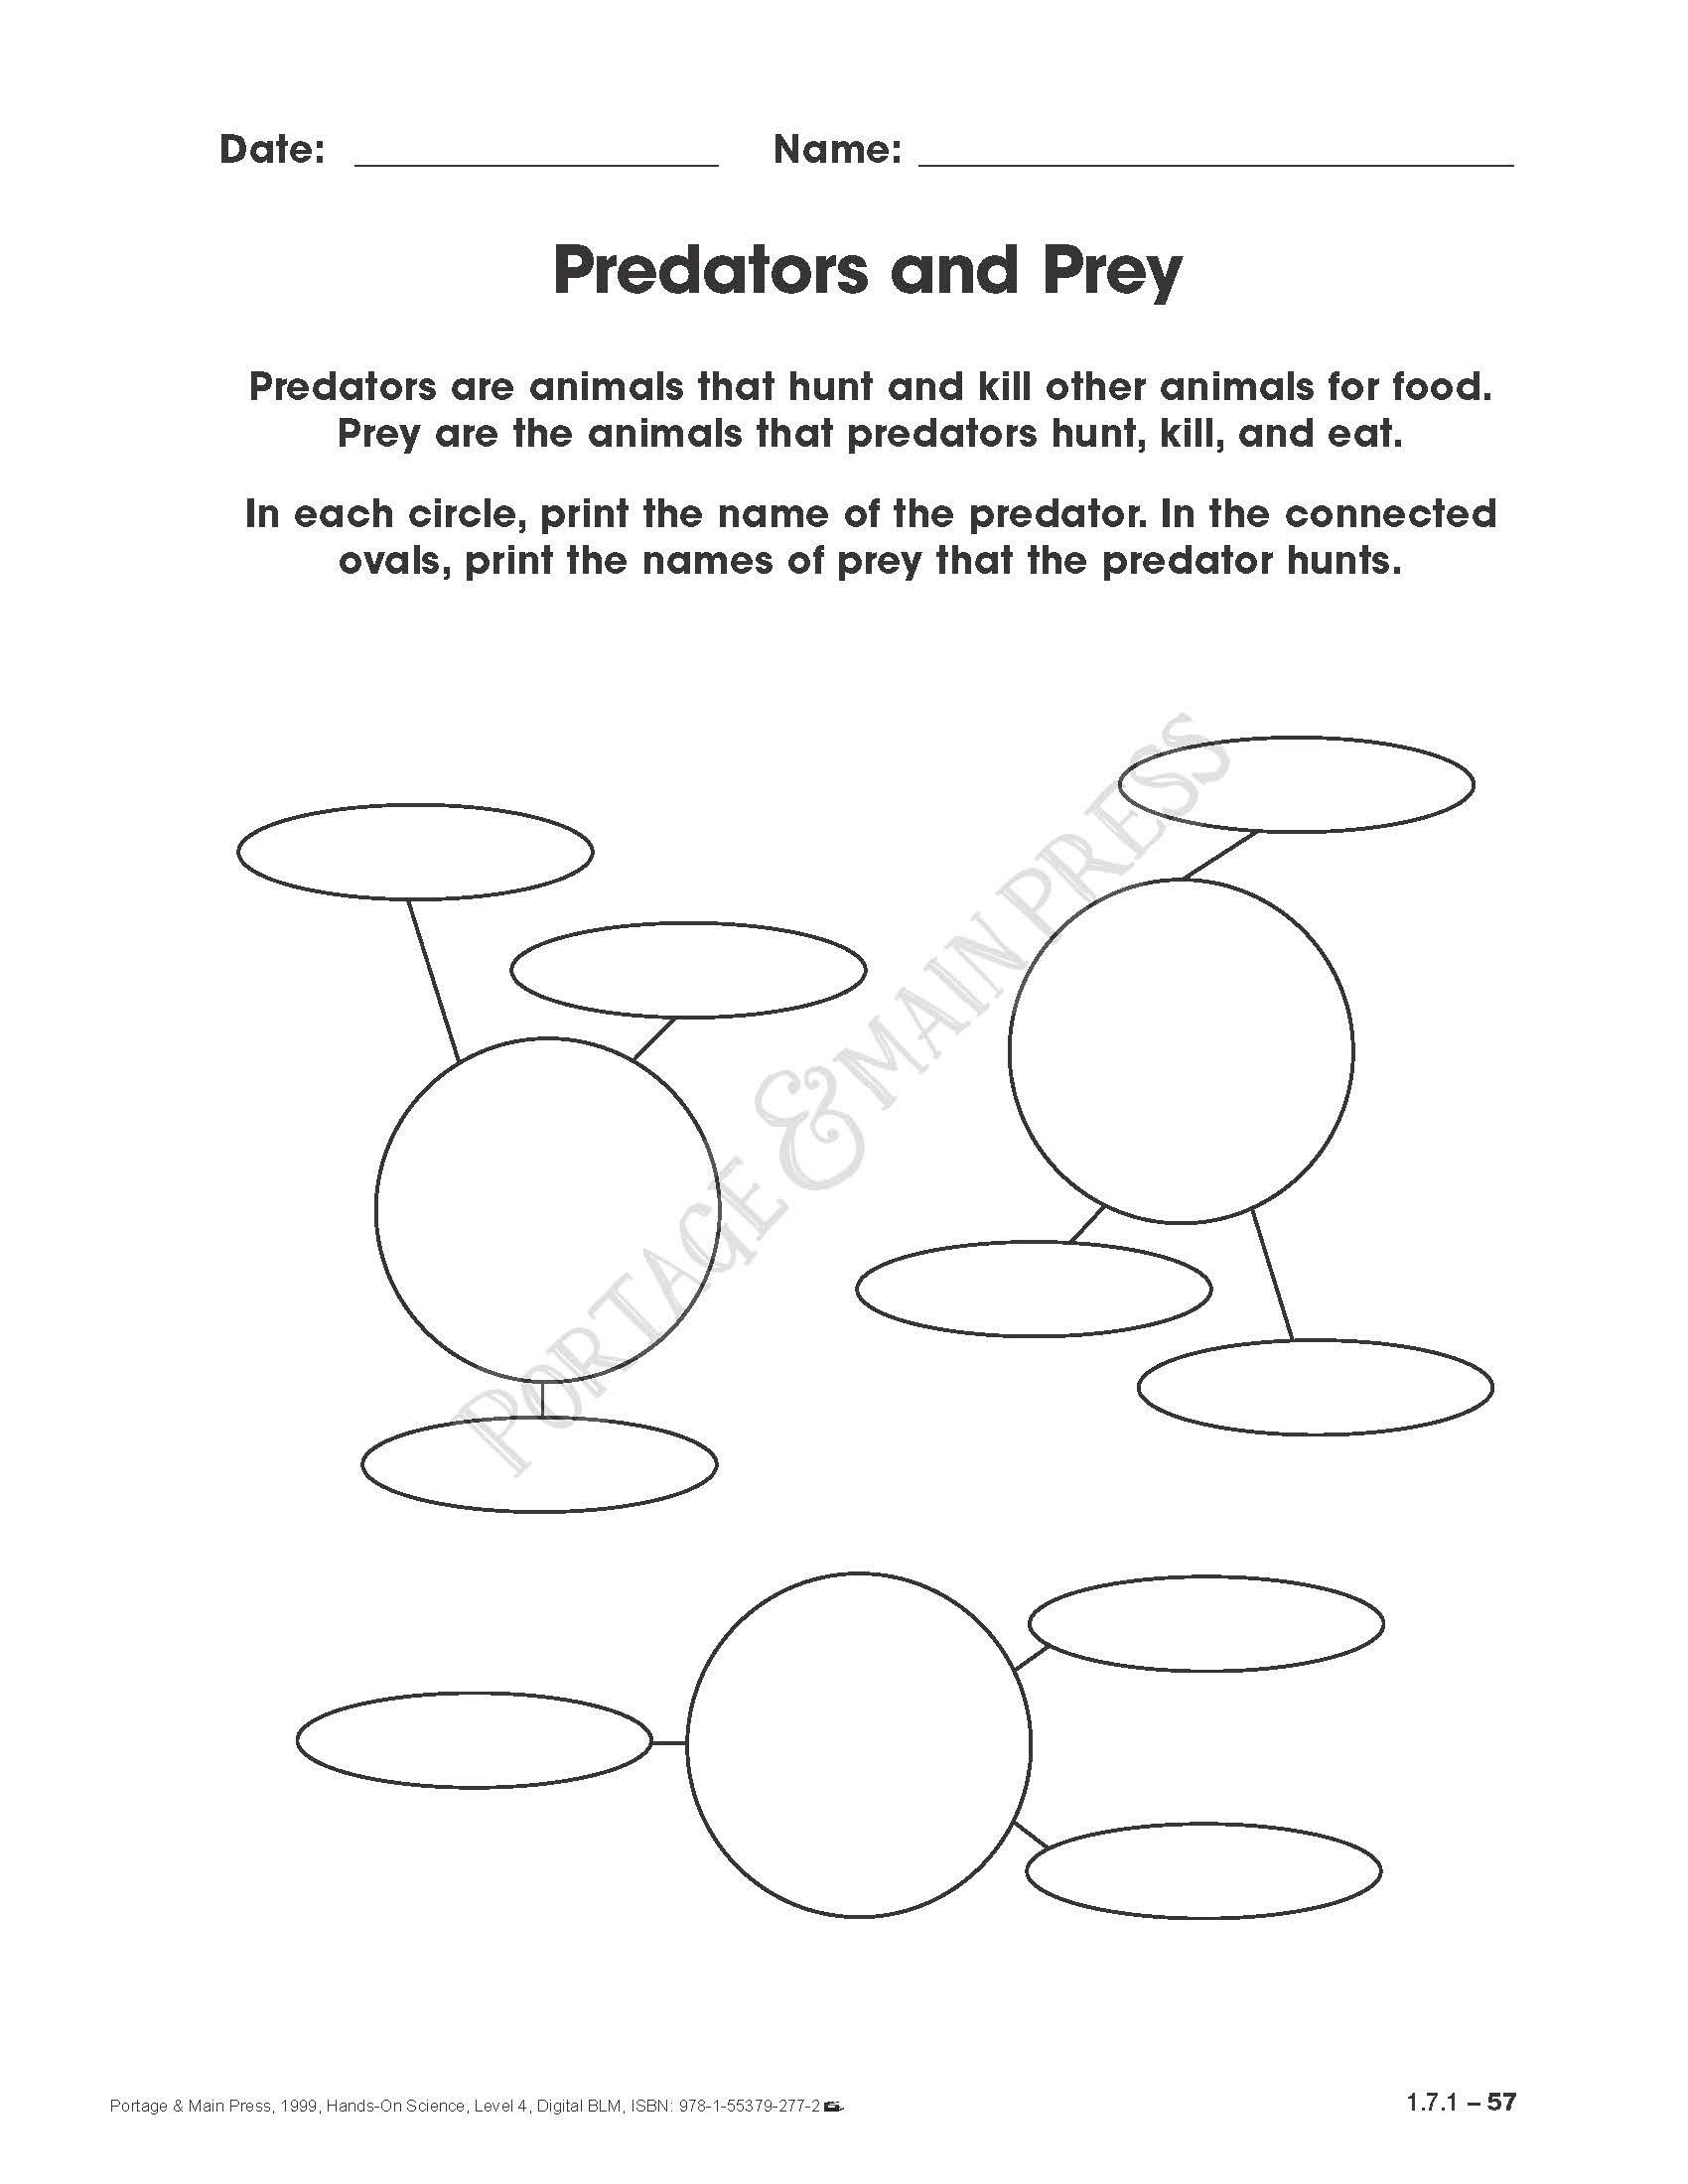 grade 4 science predators and prey activity sheet food chains pinterest activities. Black Bedroom Furniture Sets. Home Design Ideas